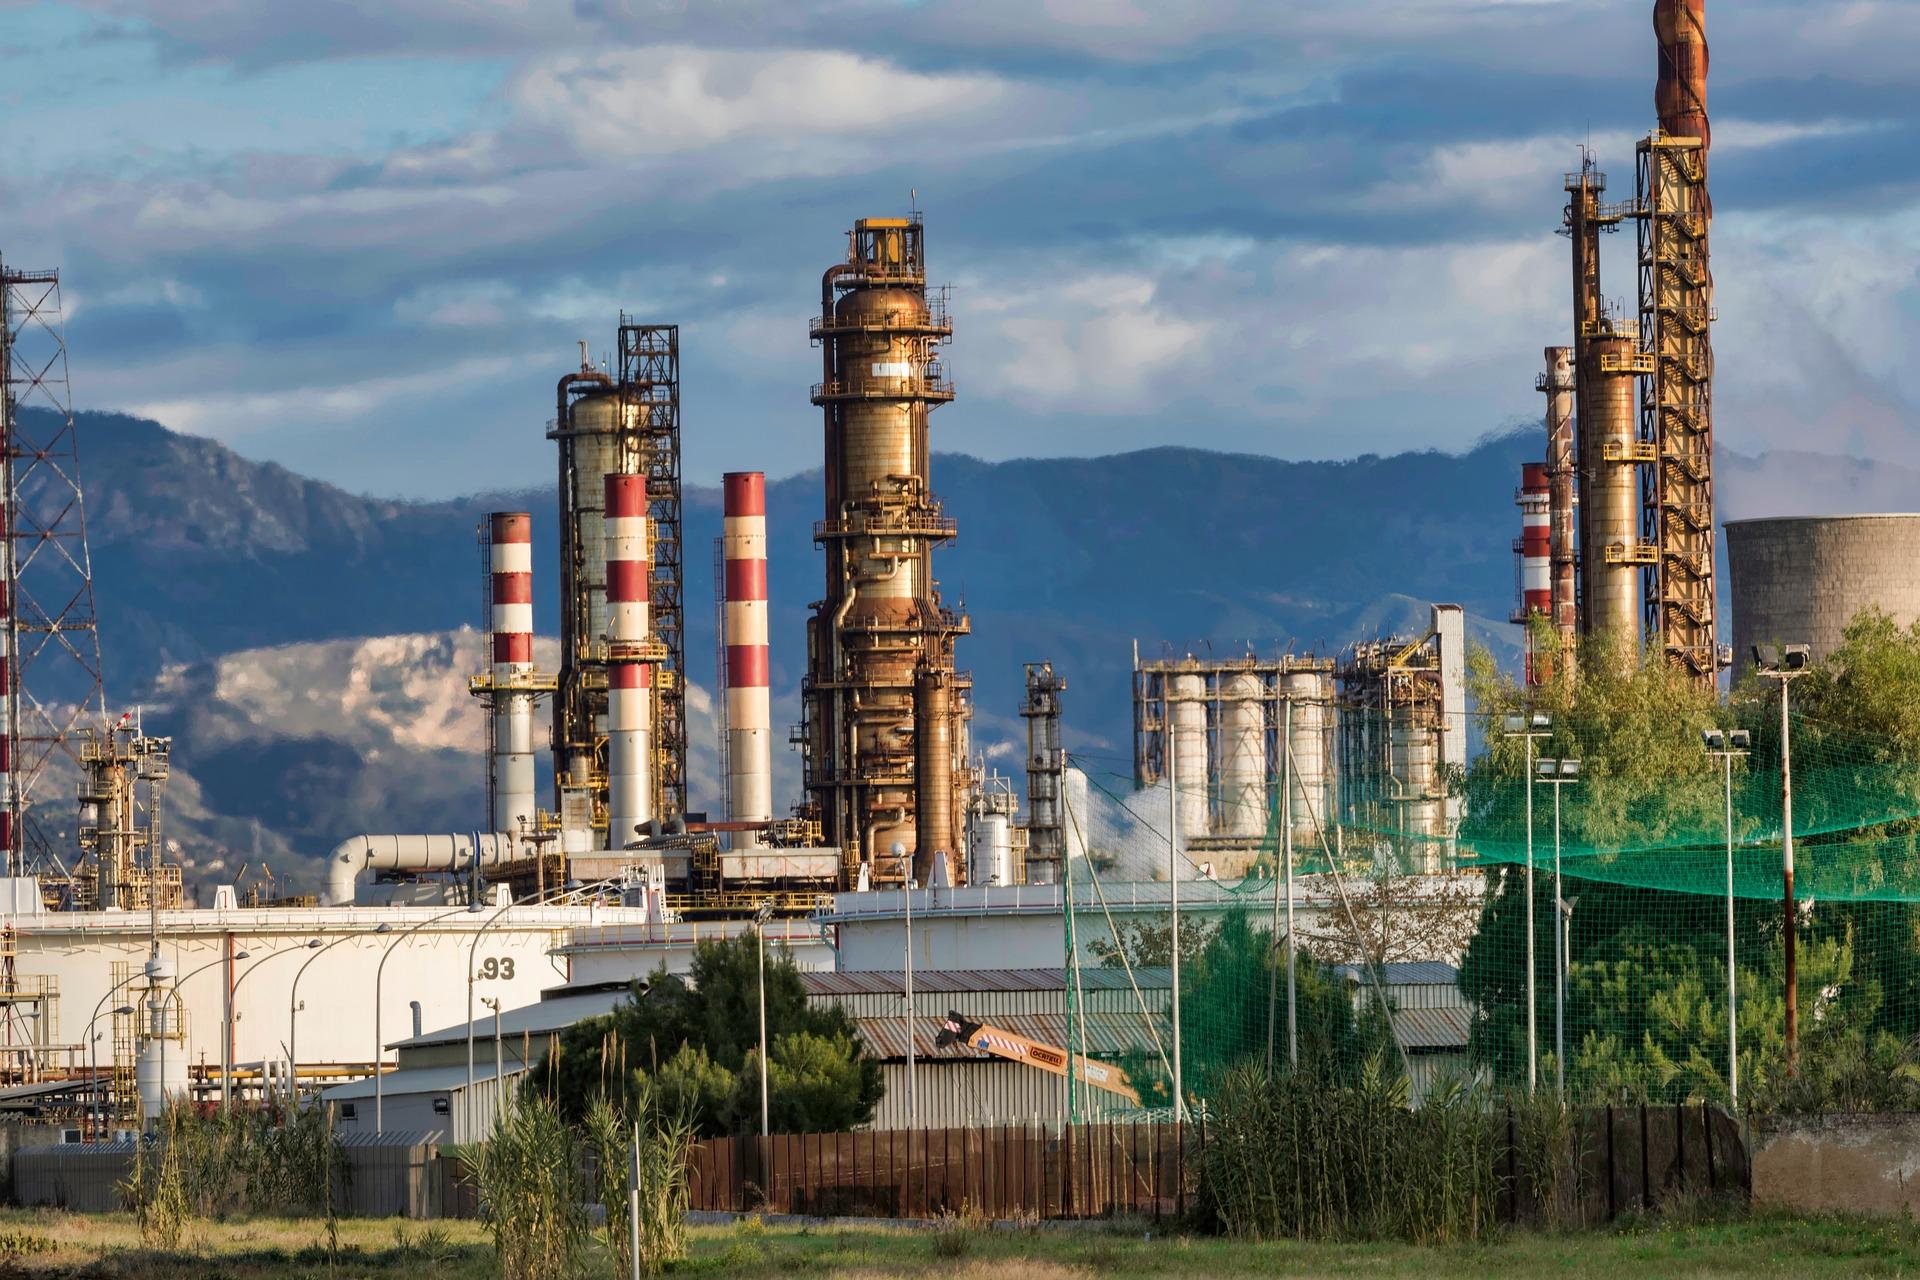 Цена на нефть снижаются из-за усиления пандемии COVID